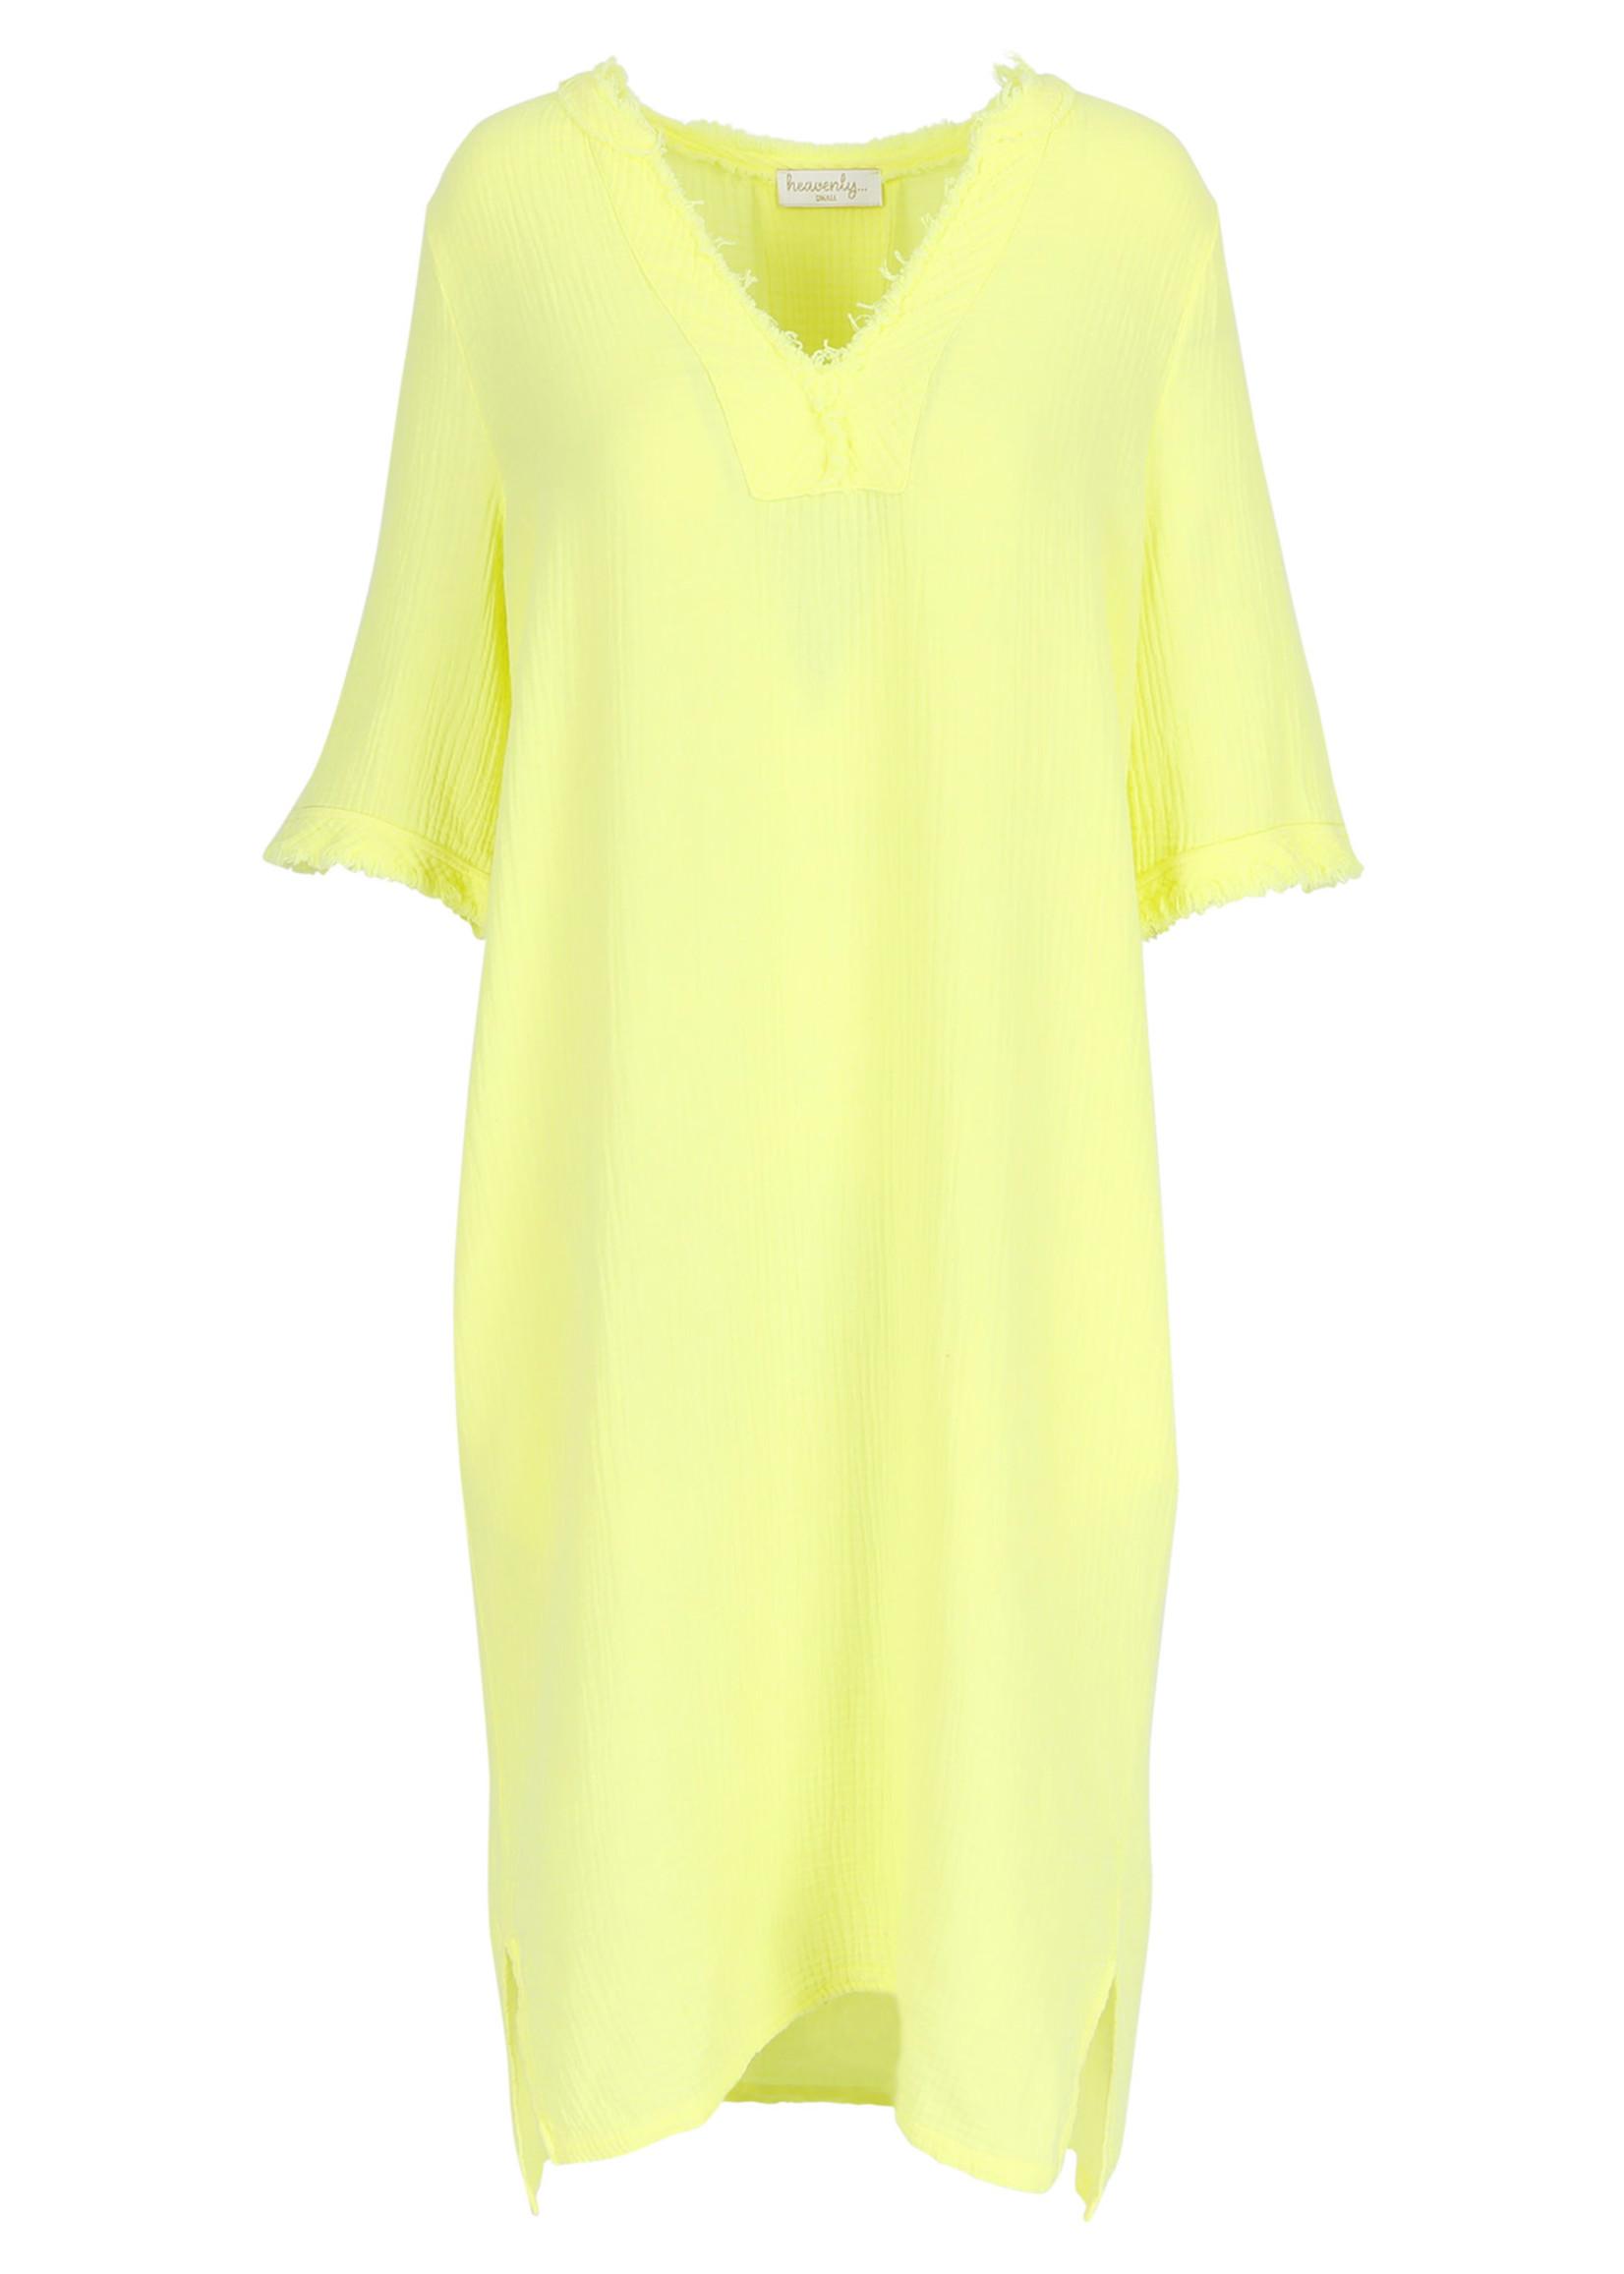 Heavenly Jenni Lemon SS20